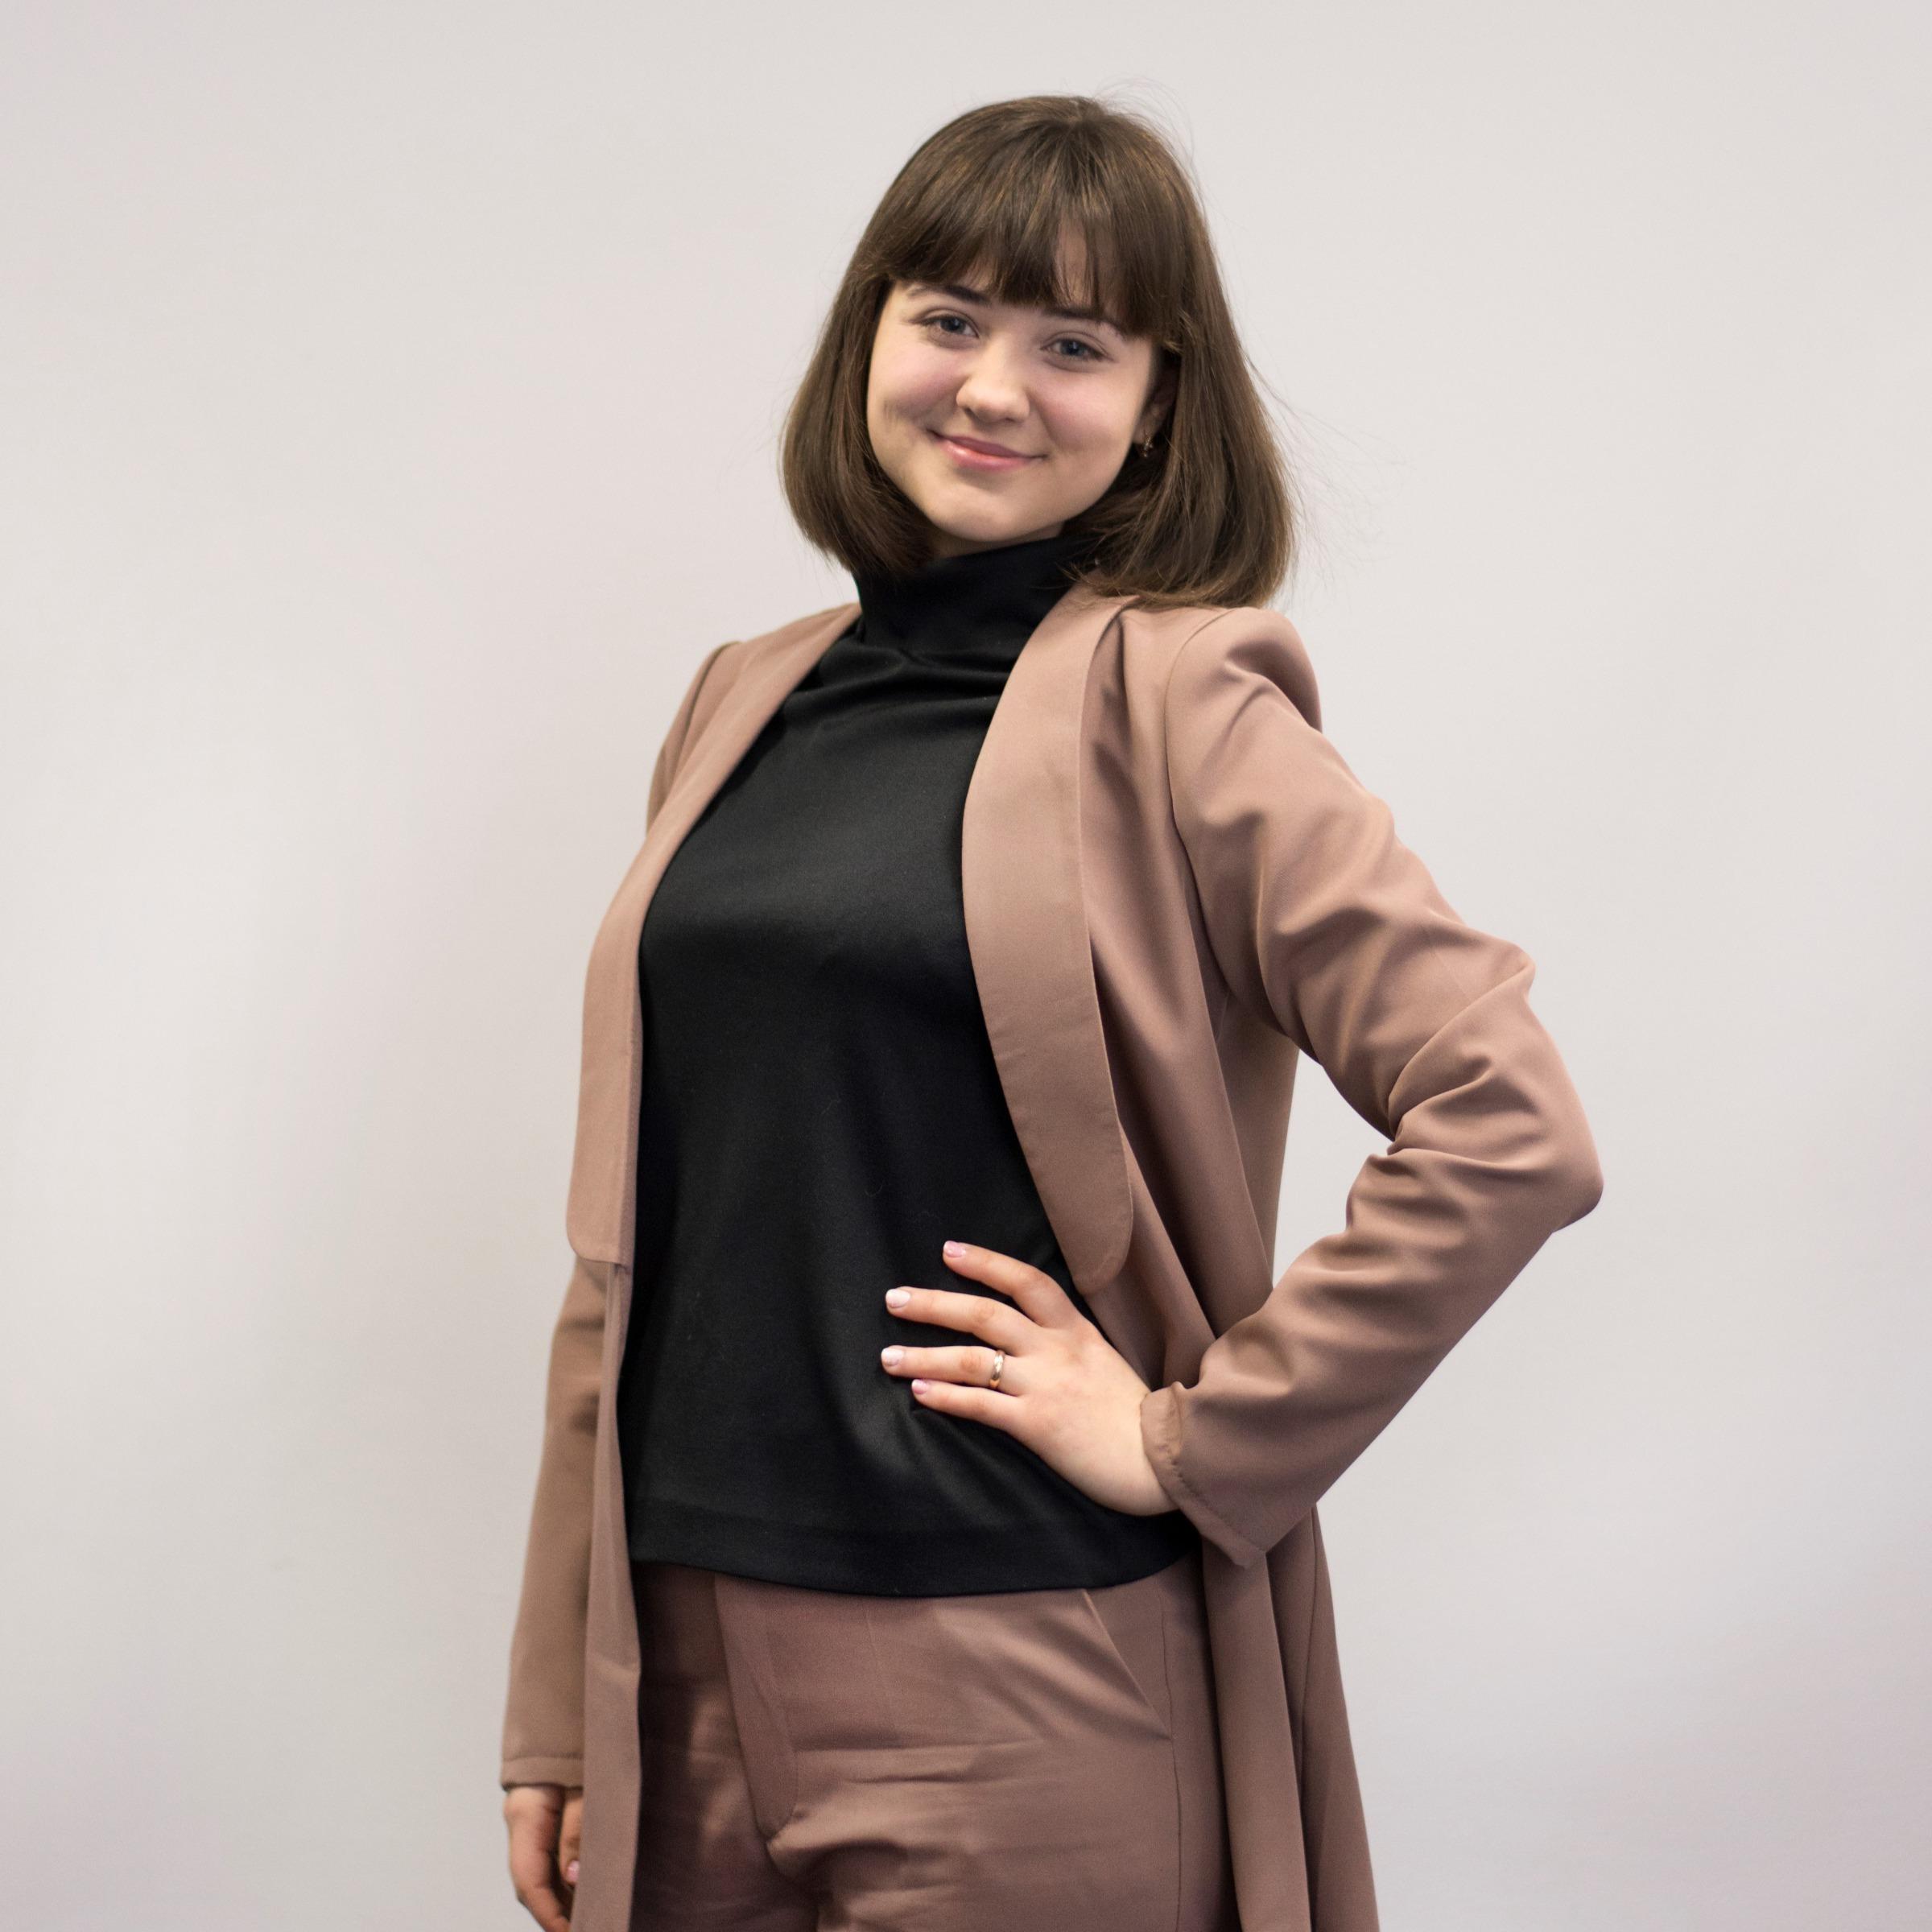 Natalie Bespala